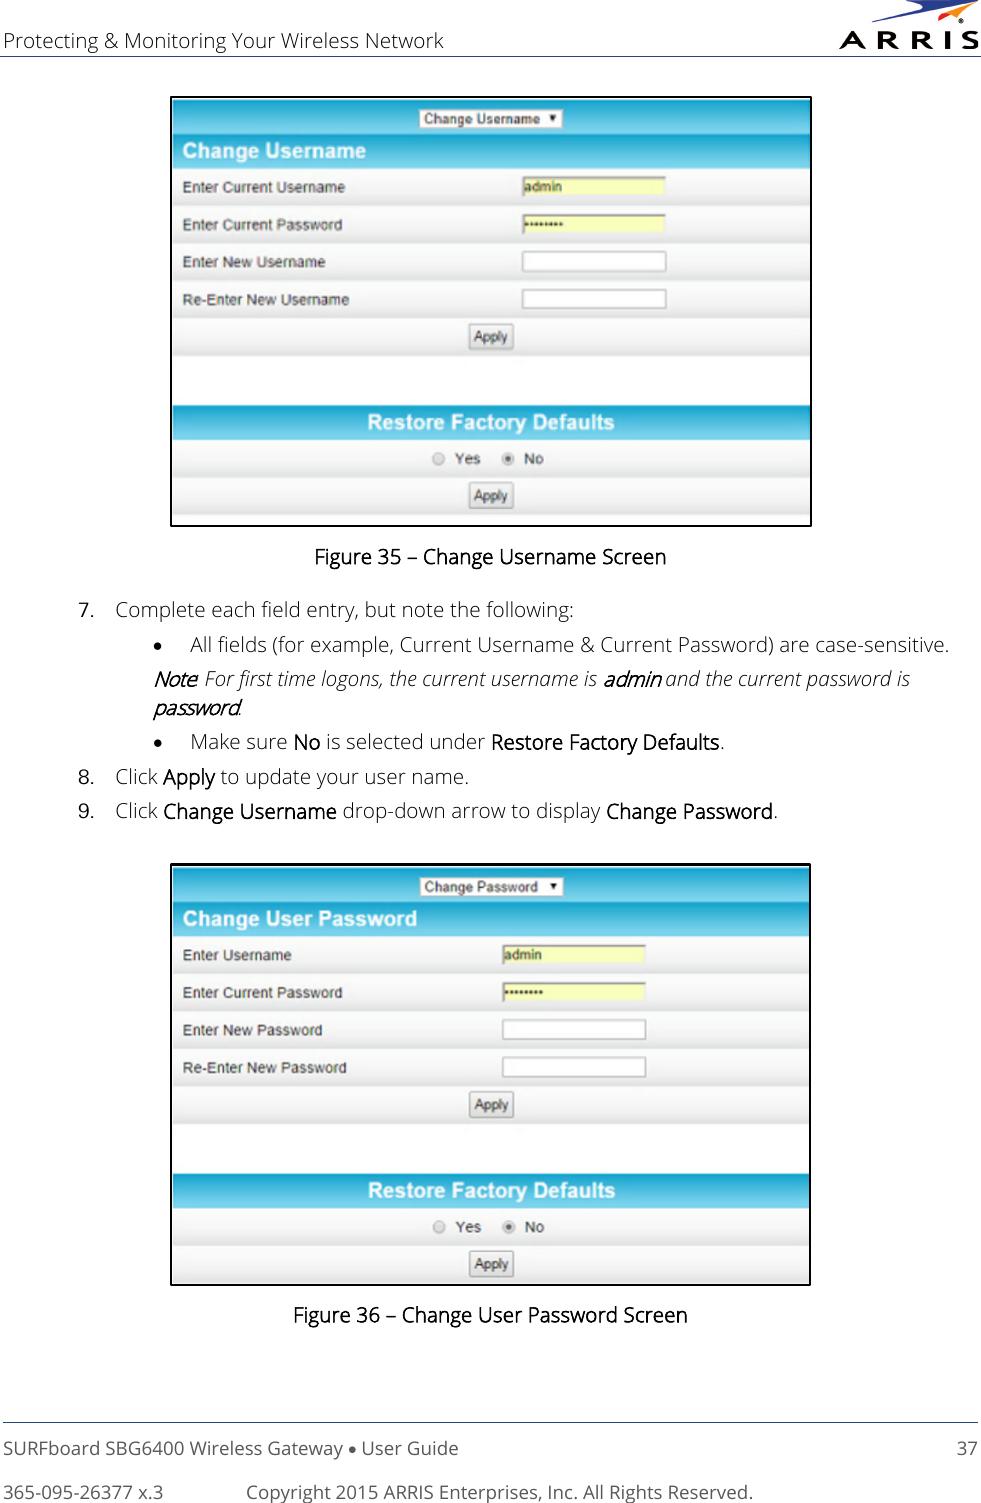 Arris SBG6400 User Manual SB6400: Guide UG 7 15